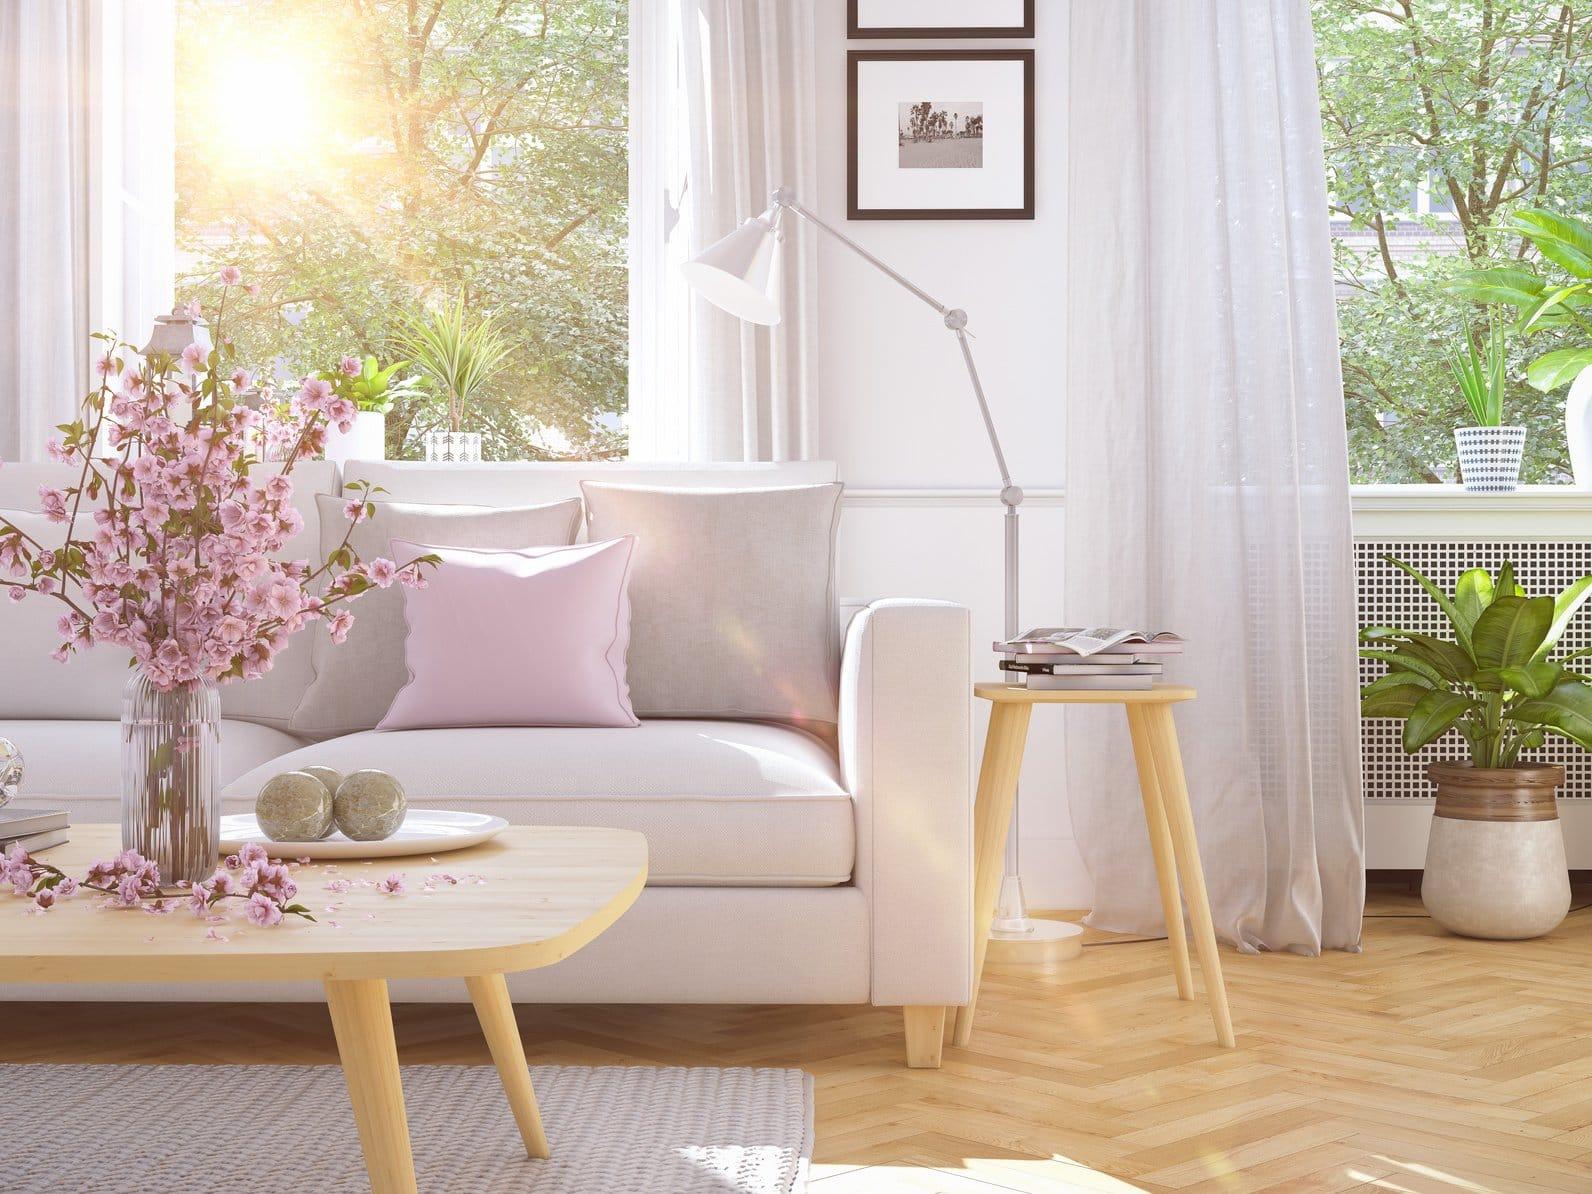 Deko Ideen Elegant Wohnung Badezimmer Dekoration Ideen Themen Phe2